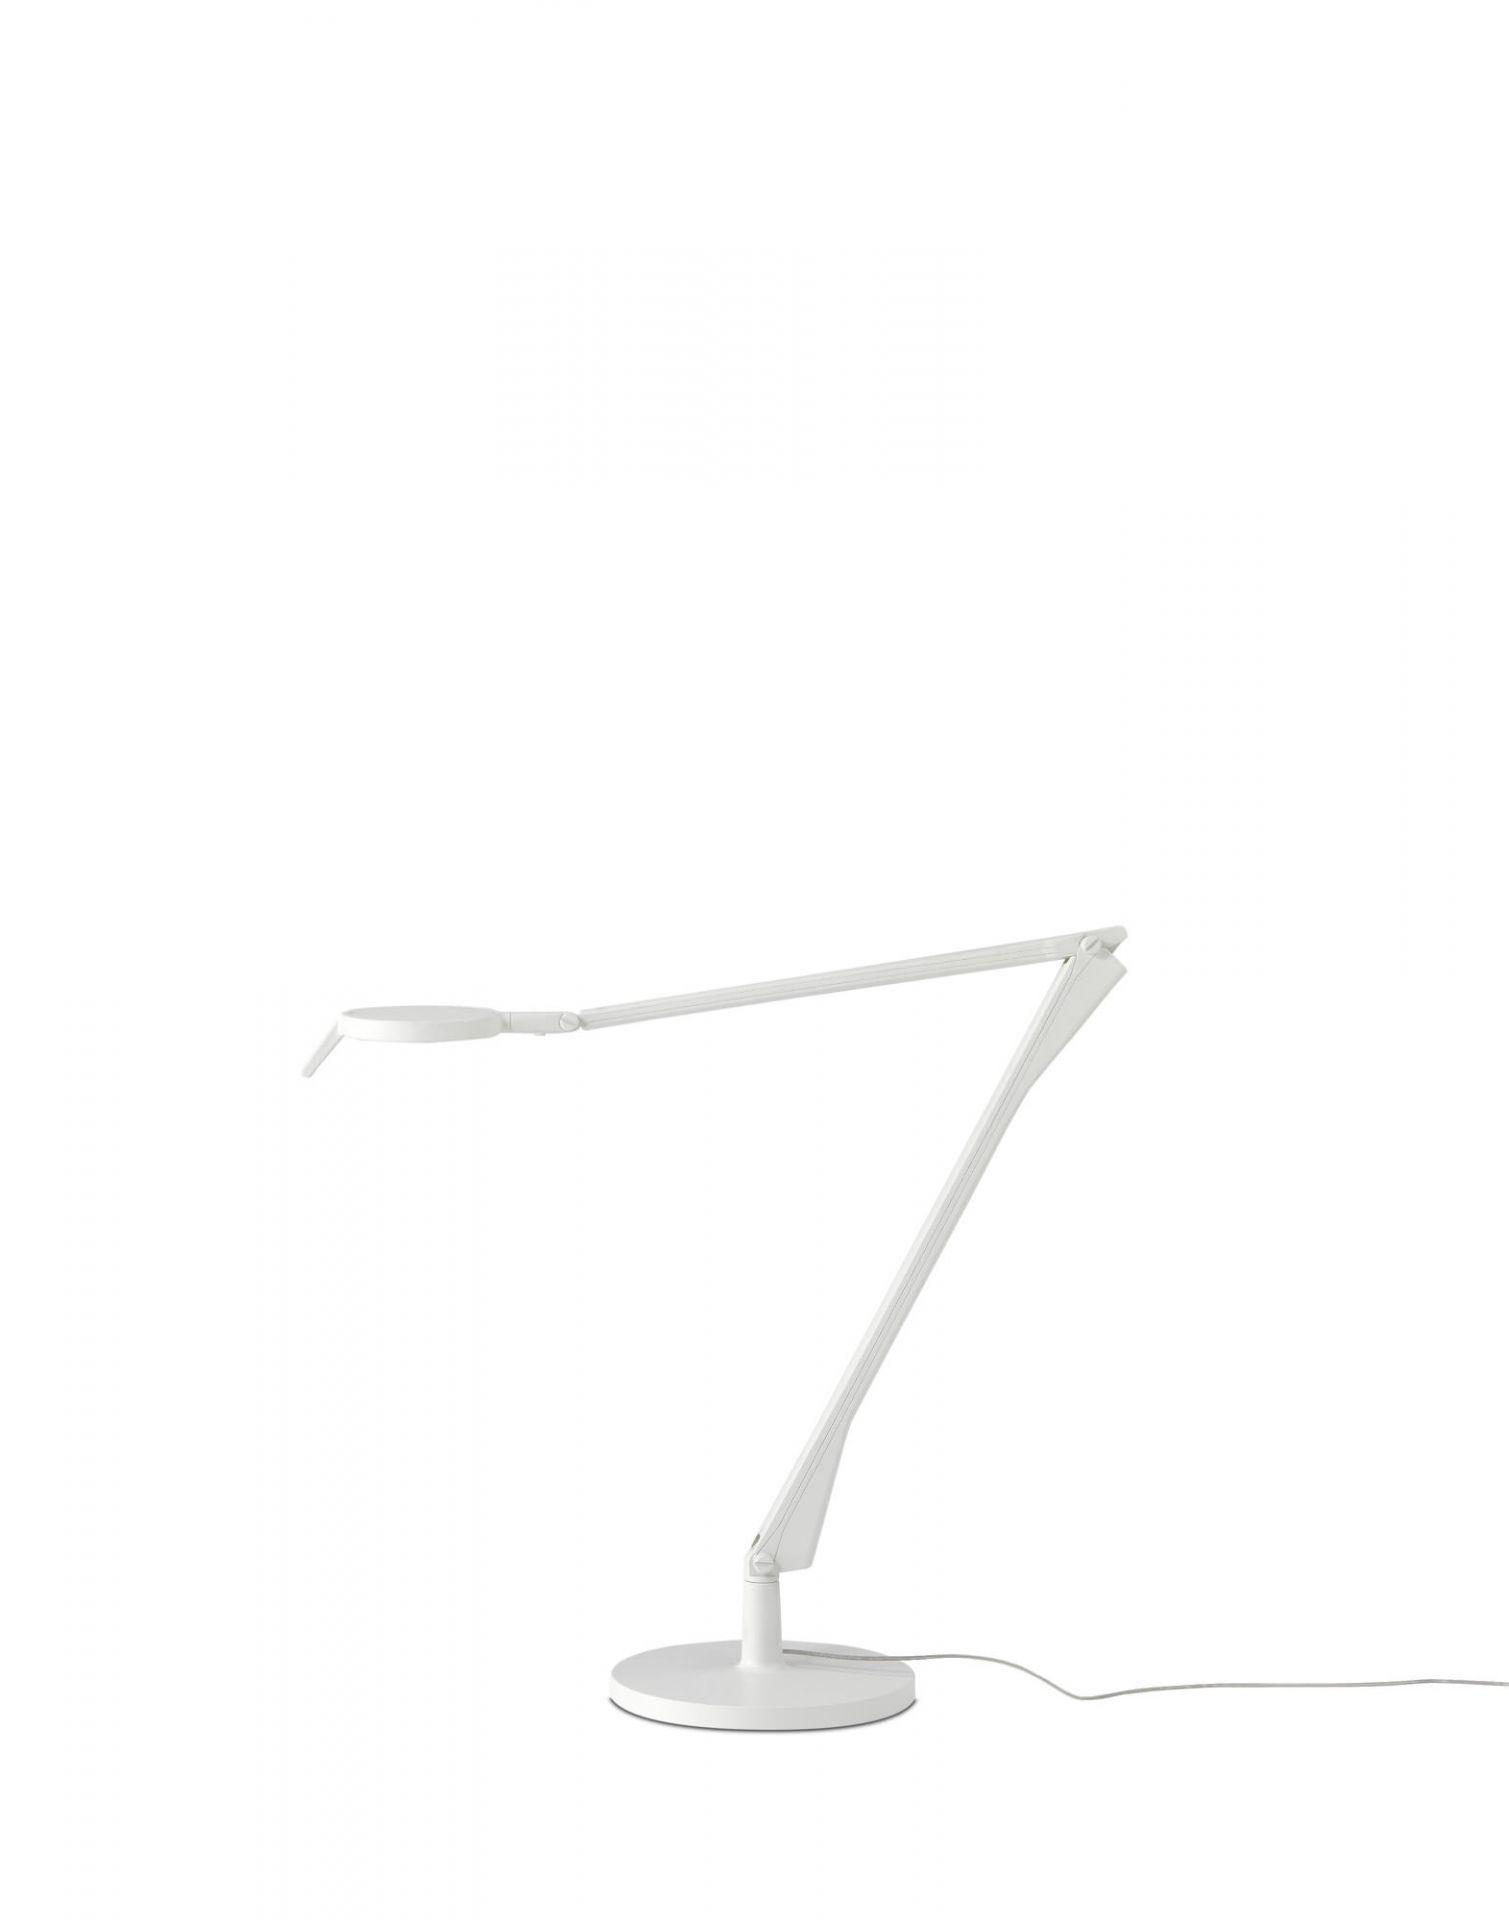 Aledin Tischleuchte mit Dimmer LED Matt Kartell